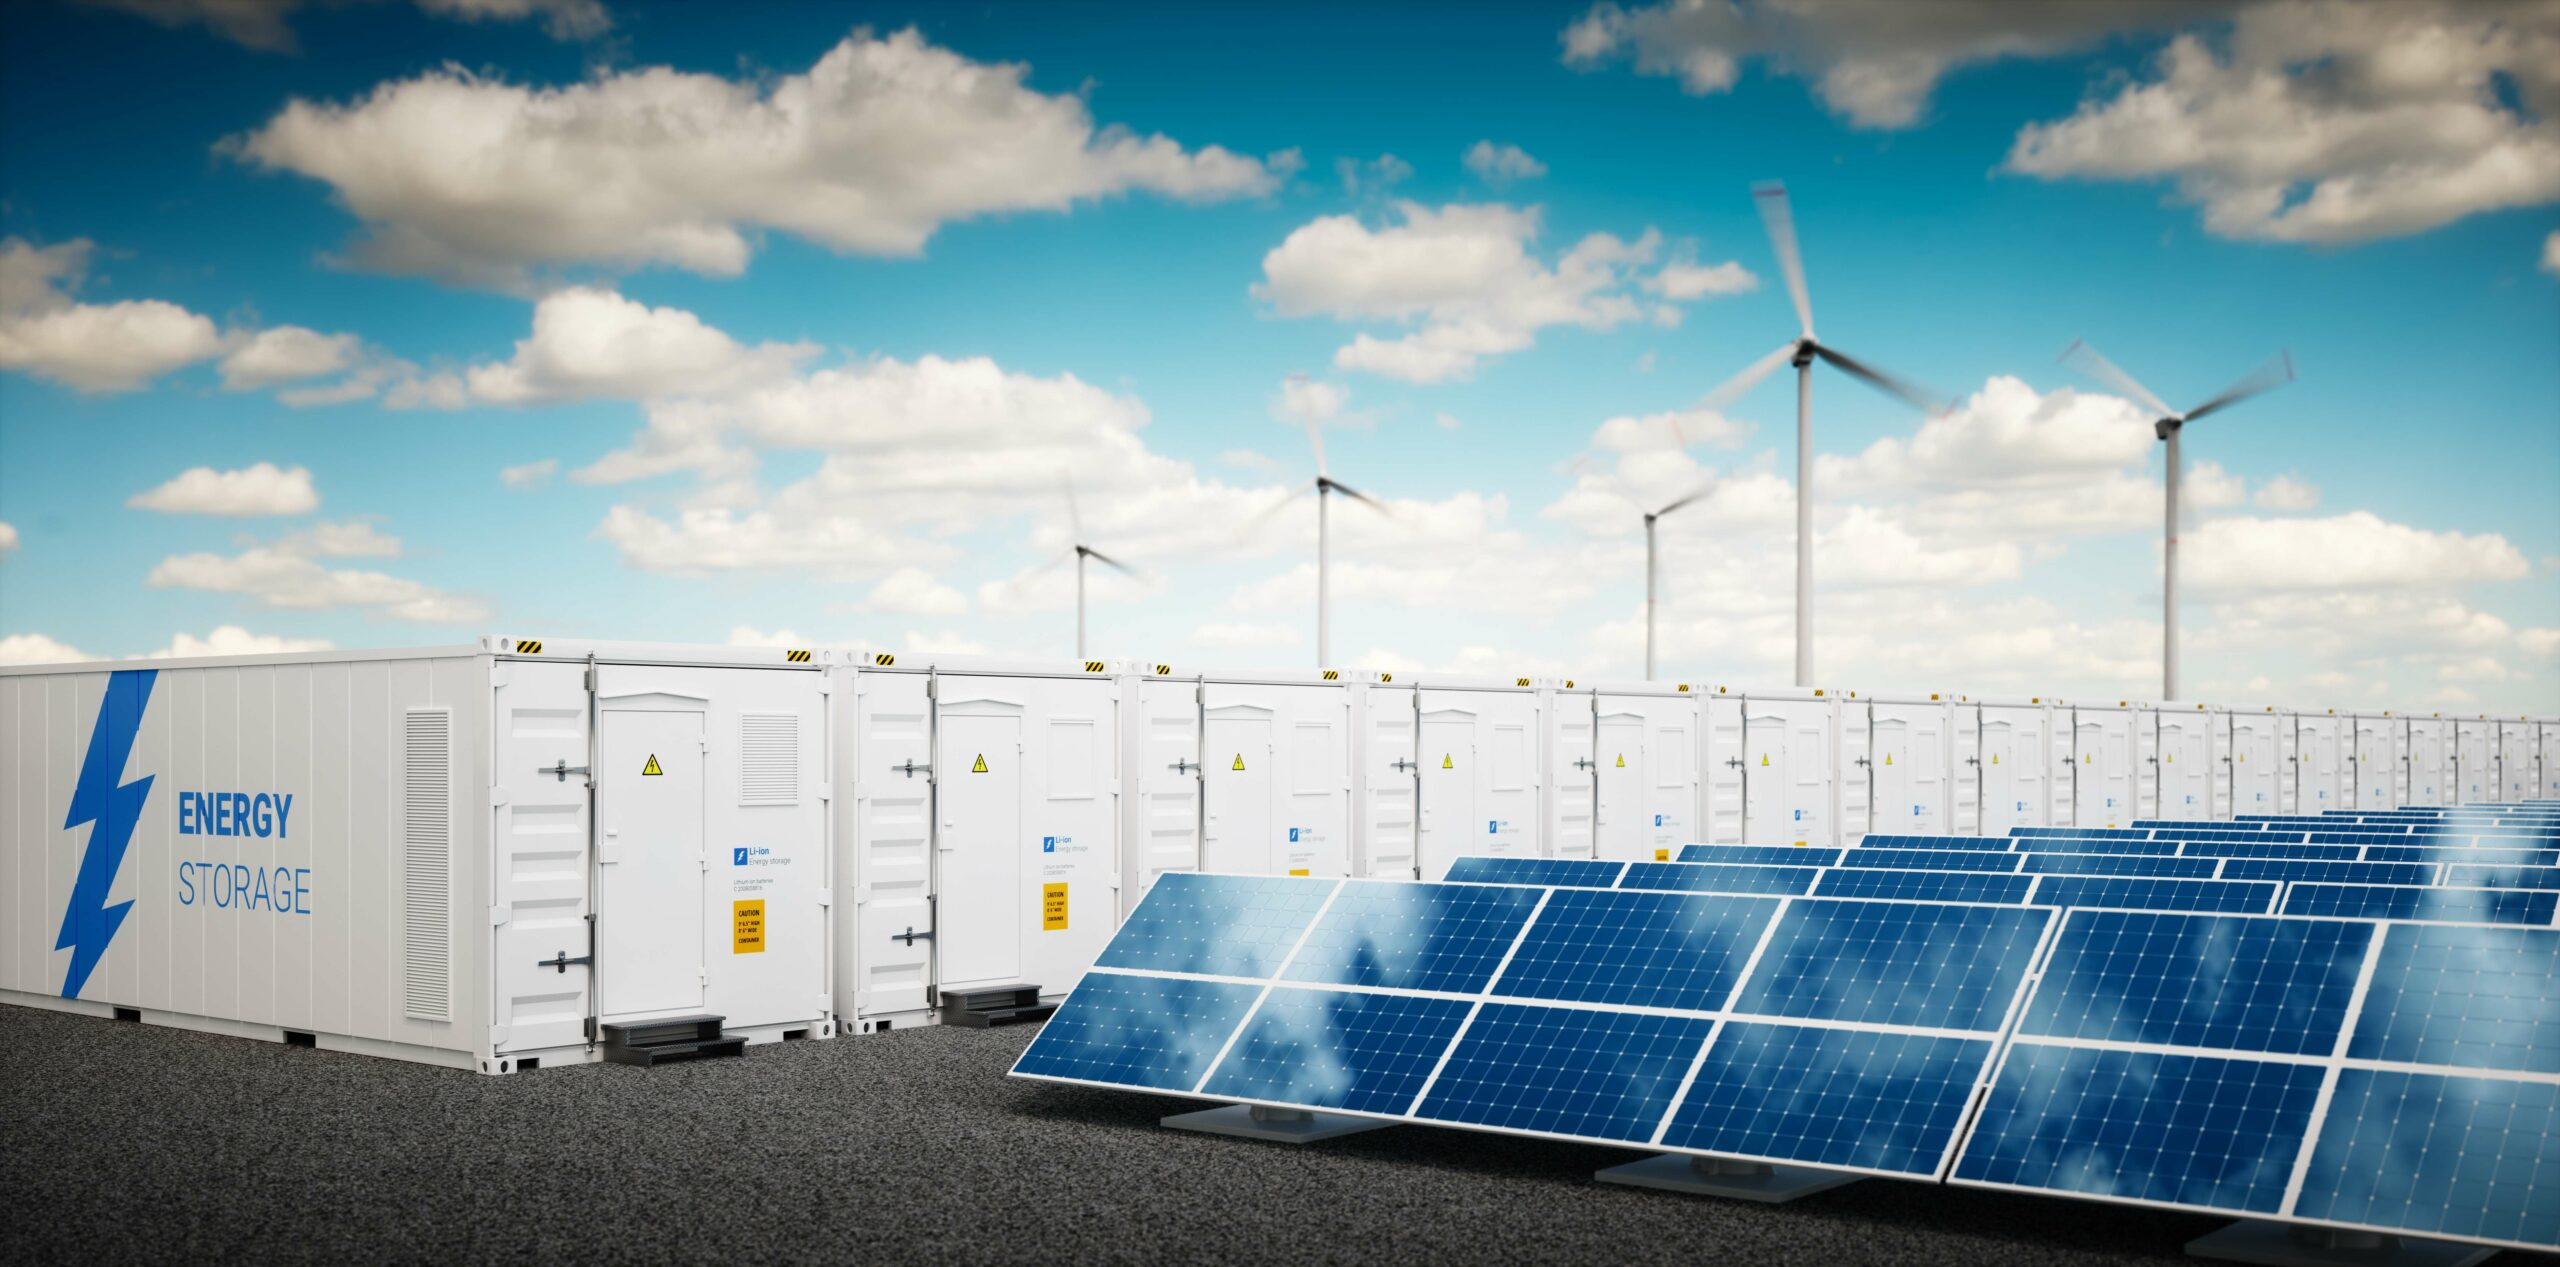 fot. 1 magazyn energii elektrycznj